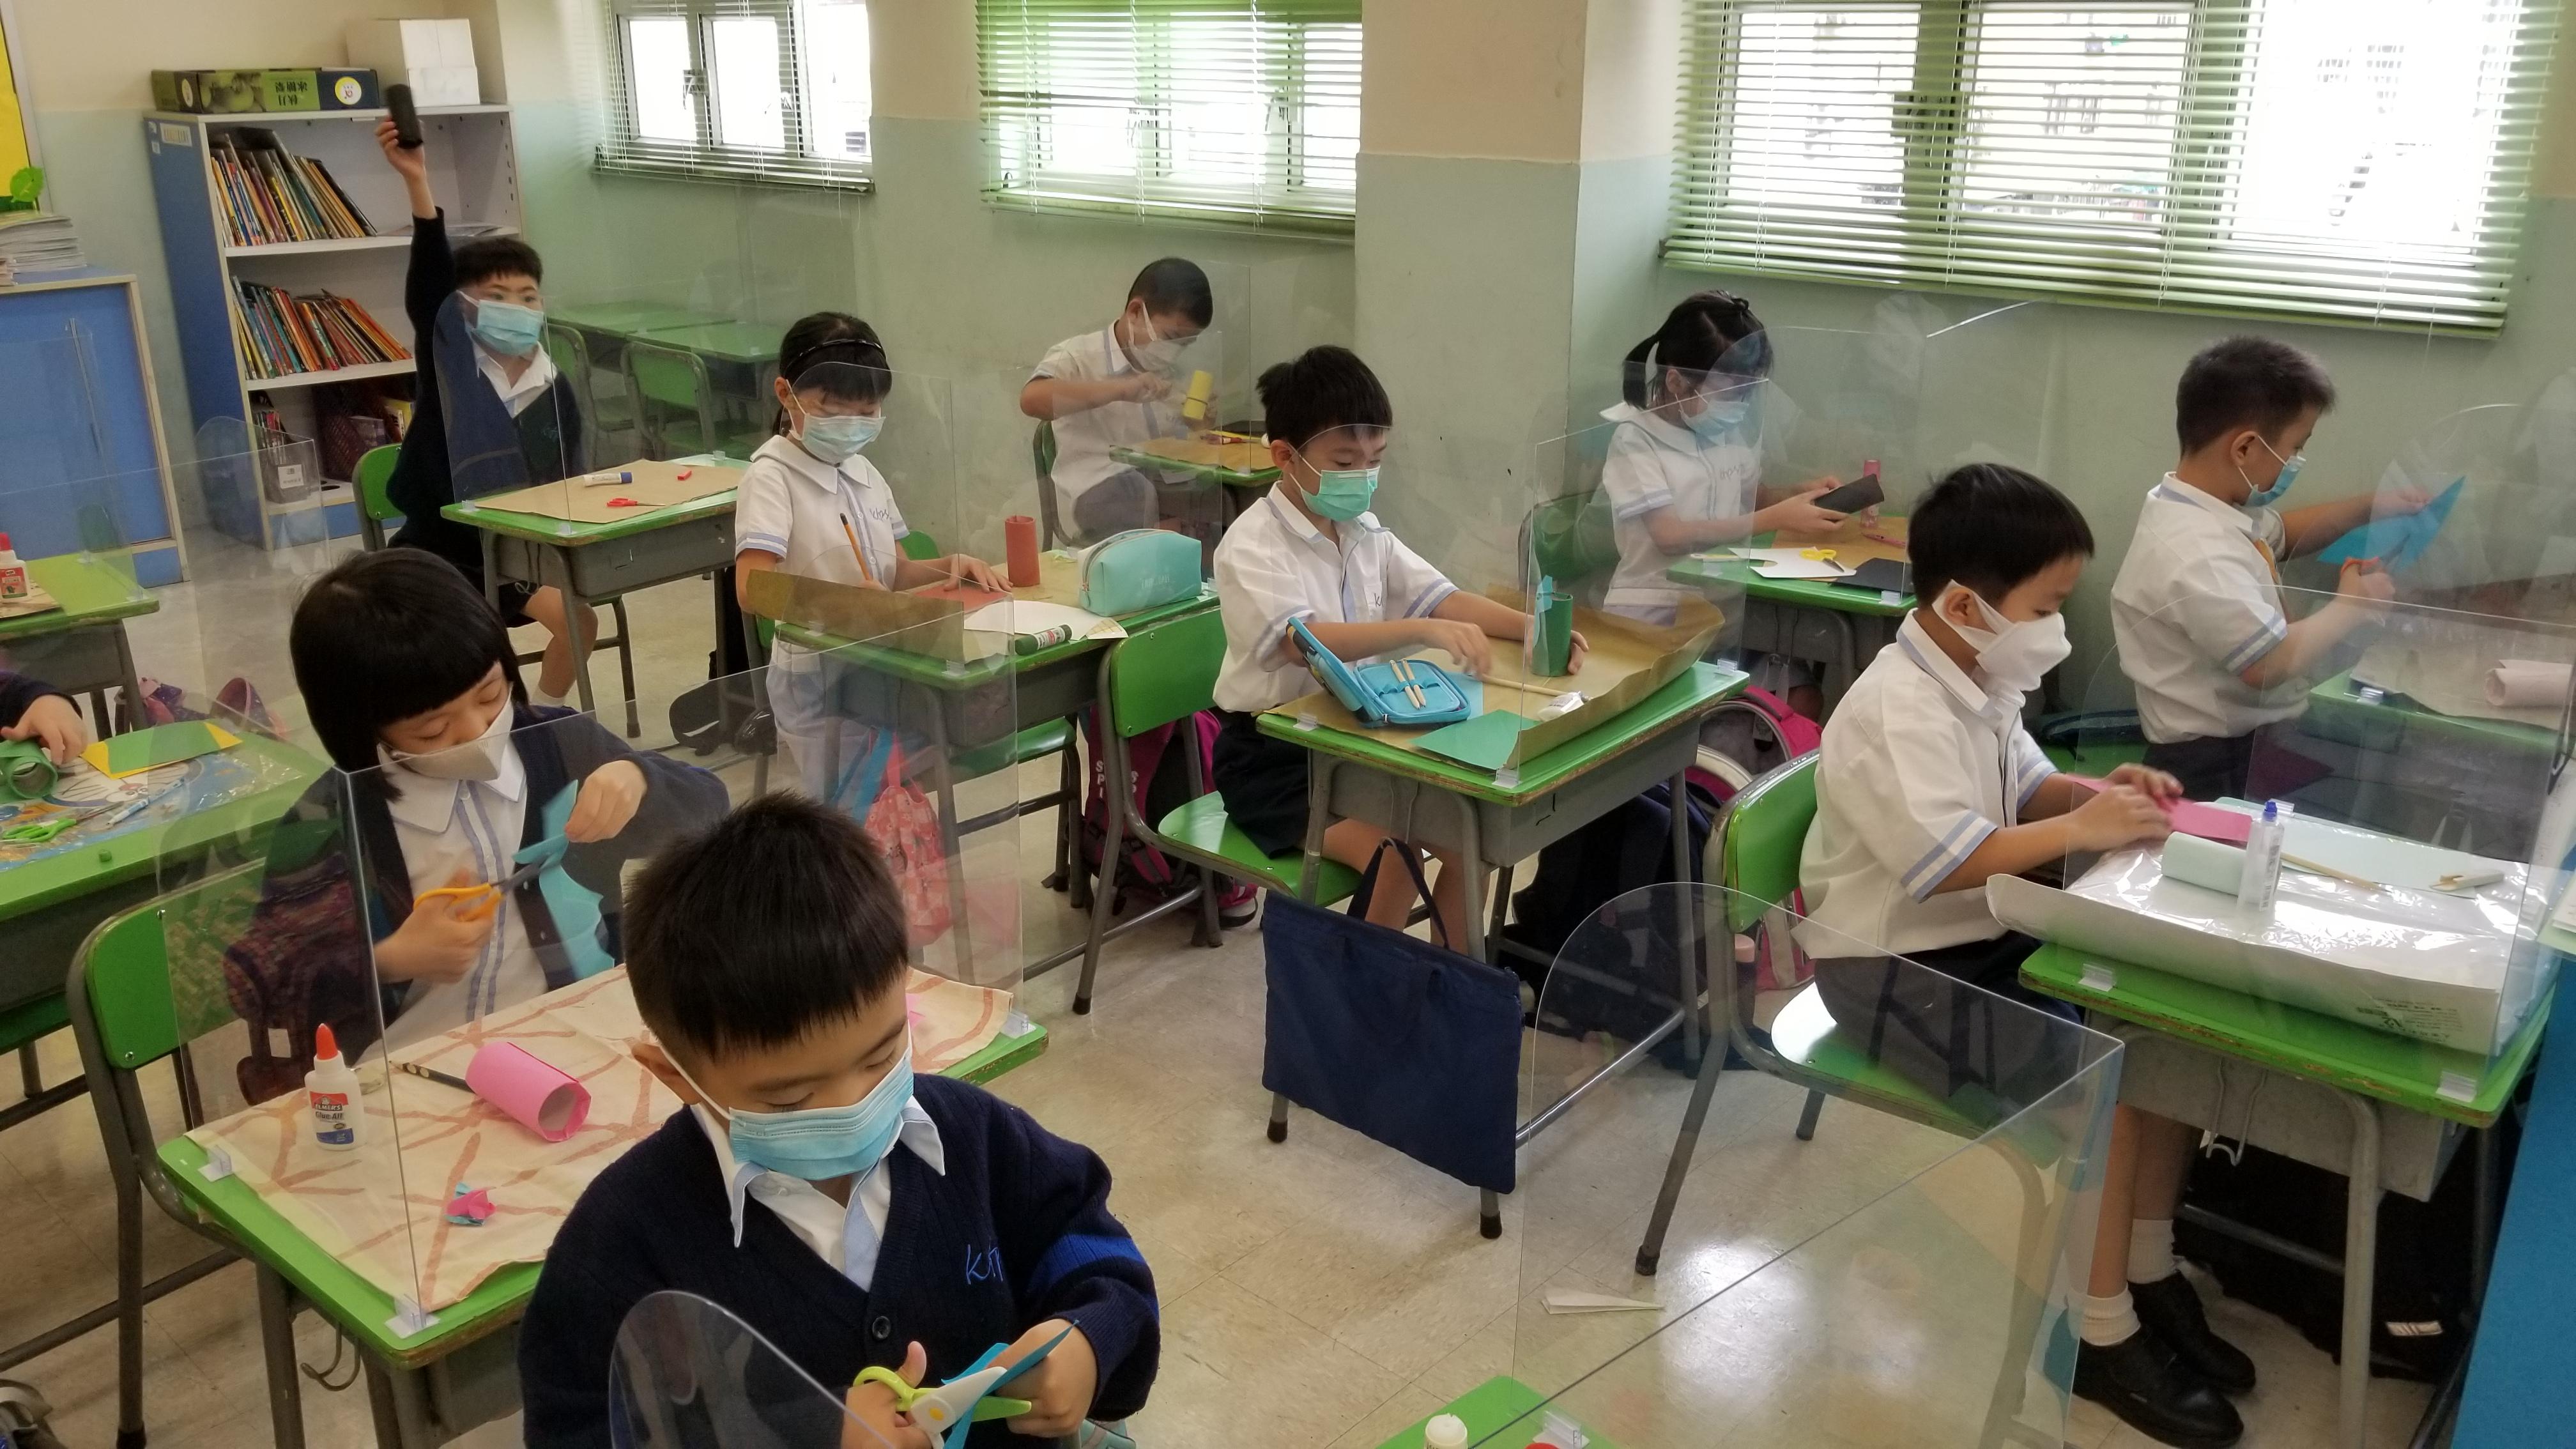 http://keito.school.hk/sites/default/files/20201007_121328.jpg